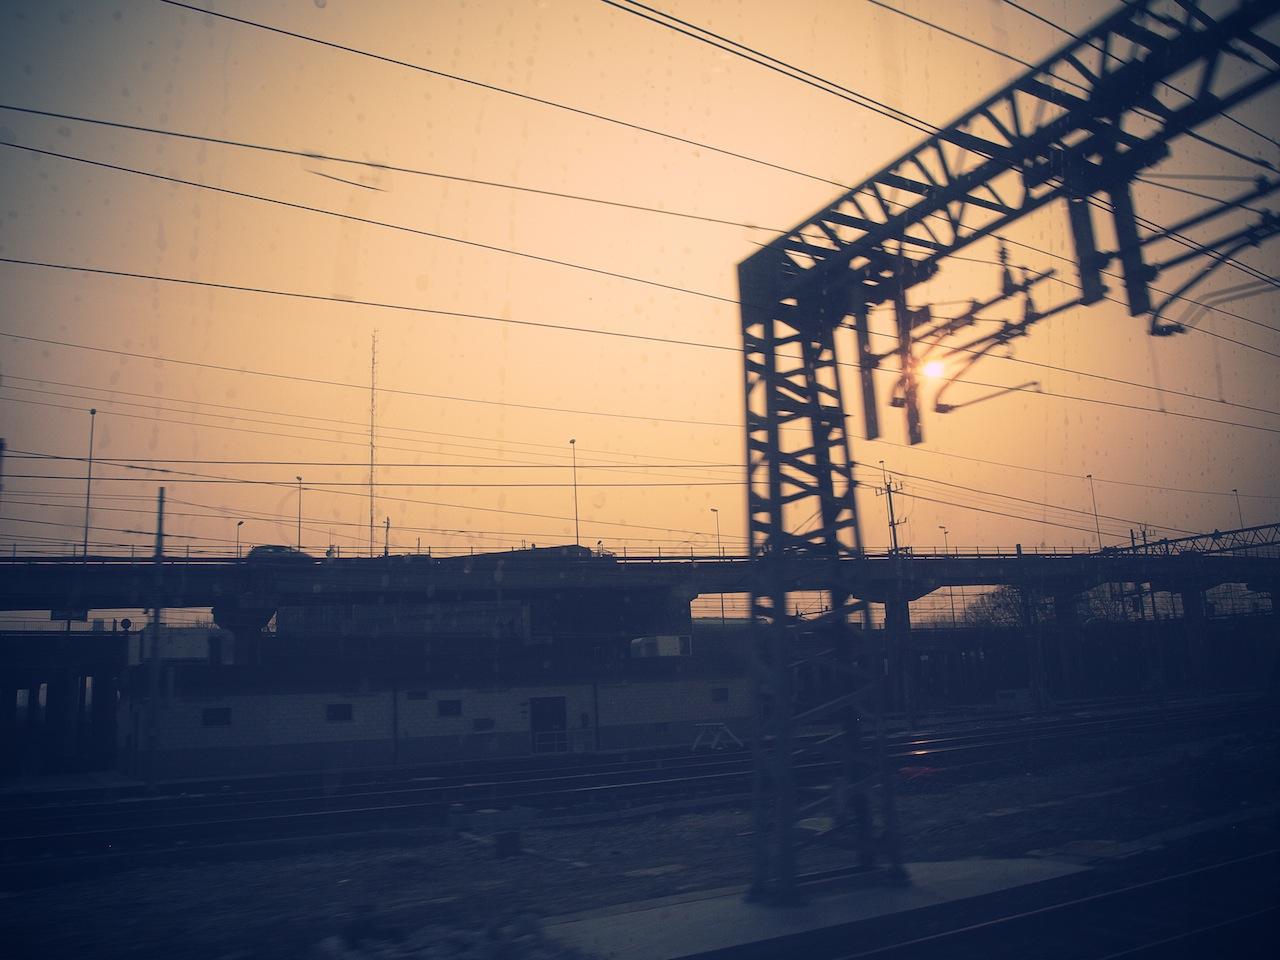 Train (To Venice  ) at Sunset  / Part of 'Trip To Italy' series by Geena Matuson @geenamatuson, 2011.